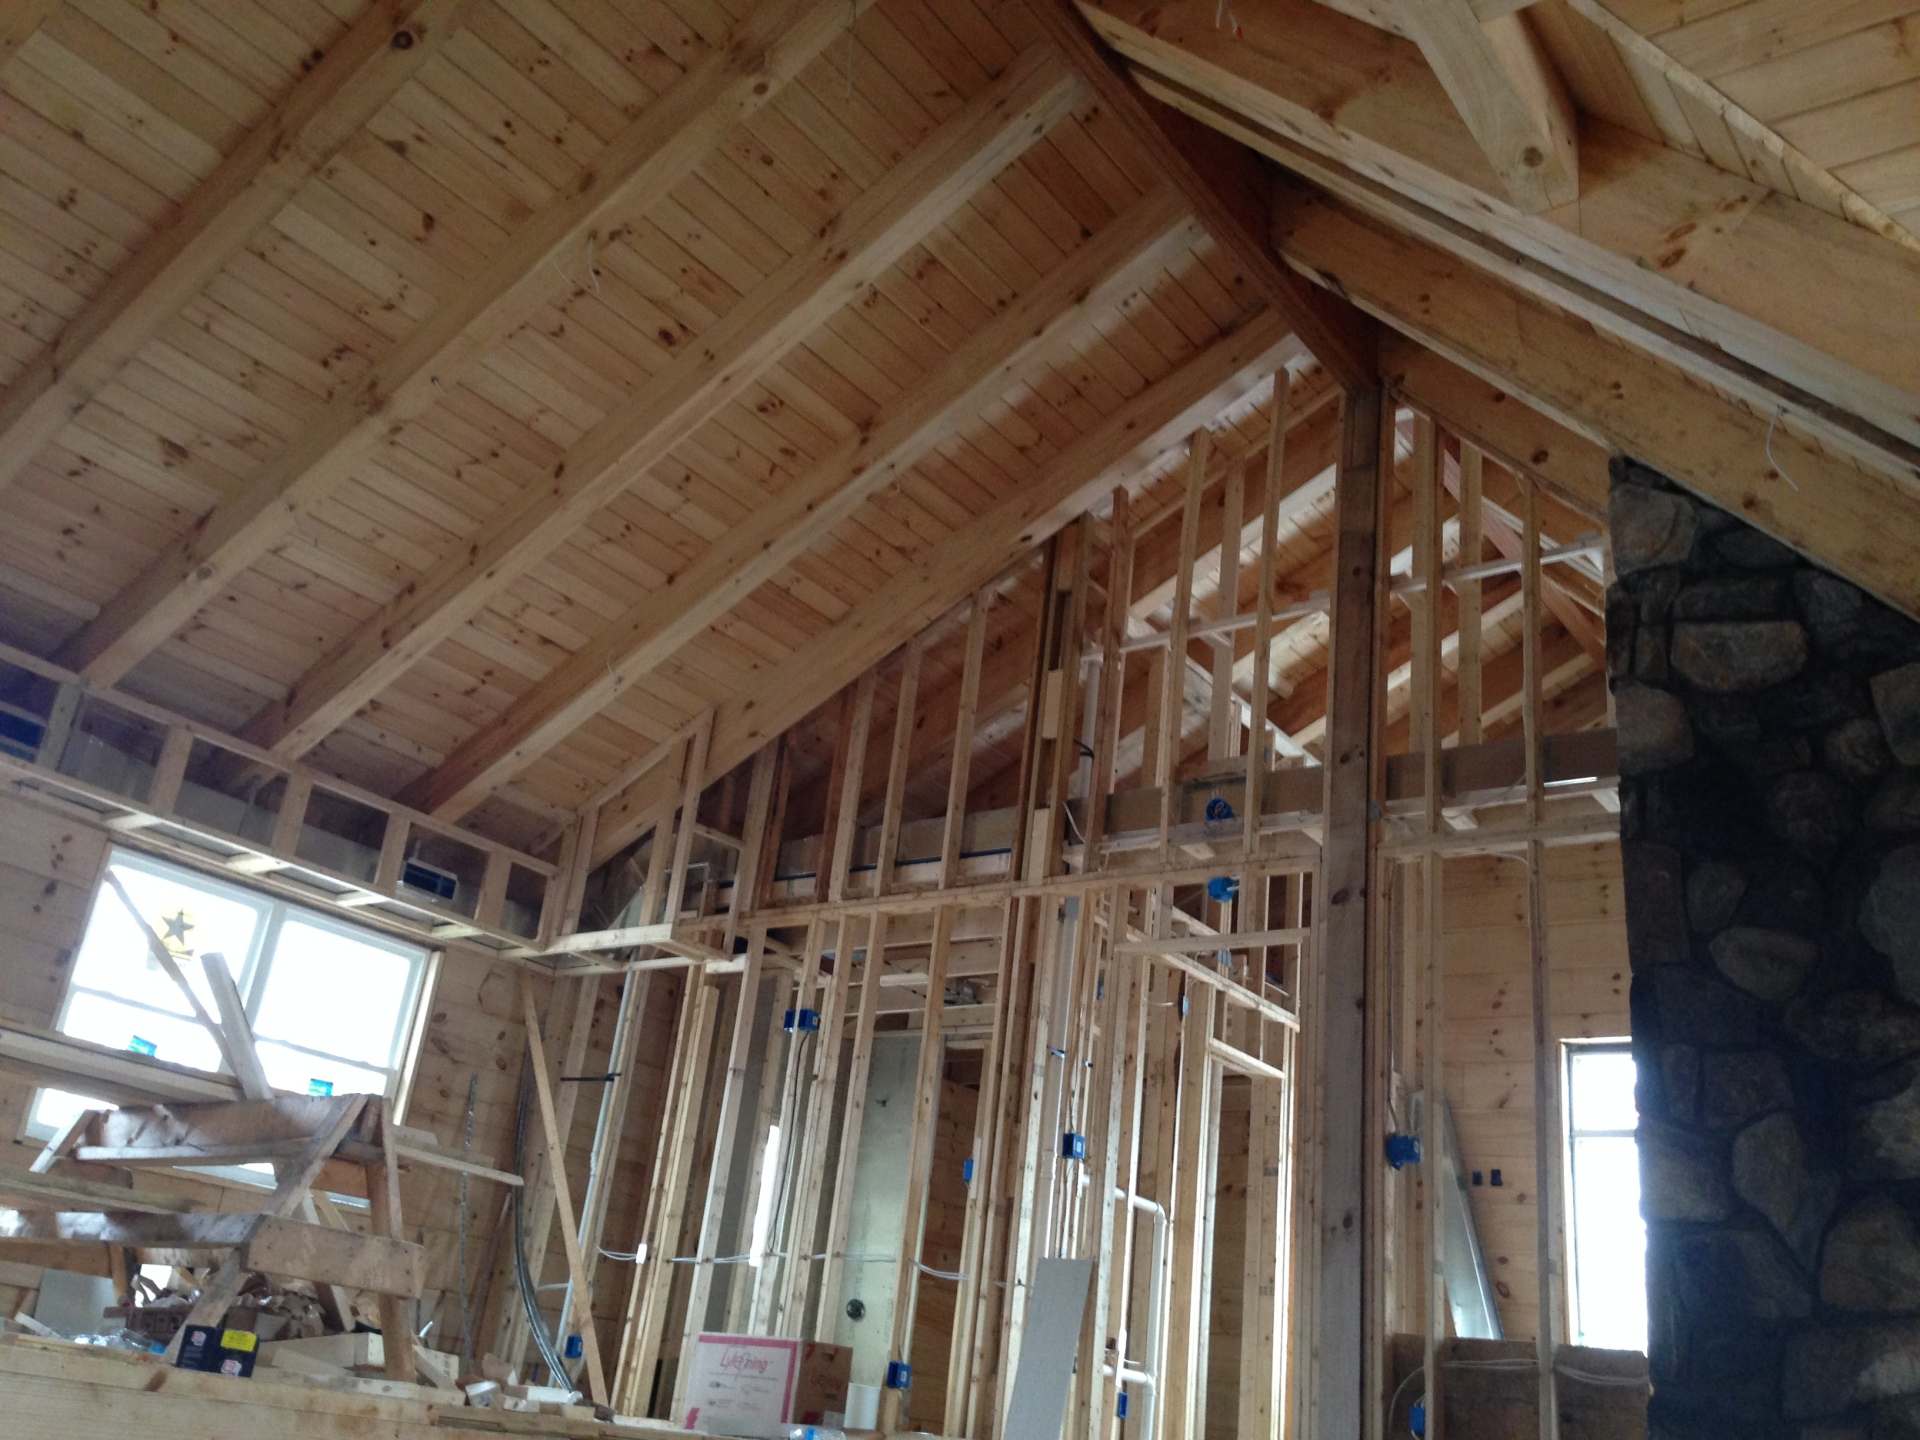 drywall repair - residential